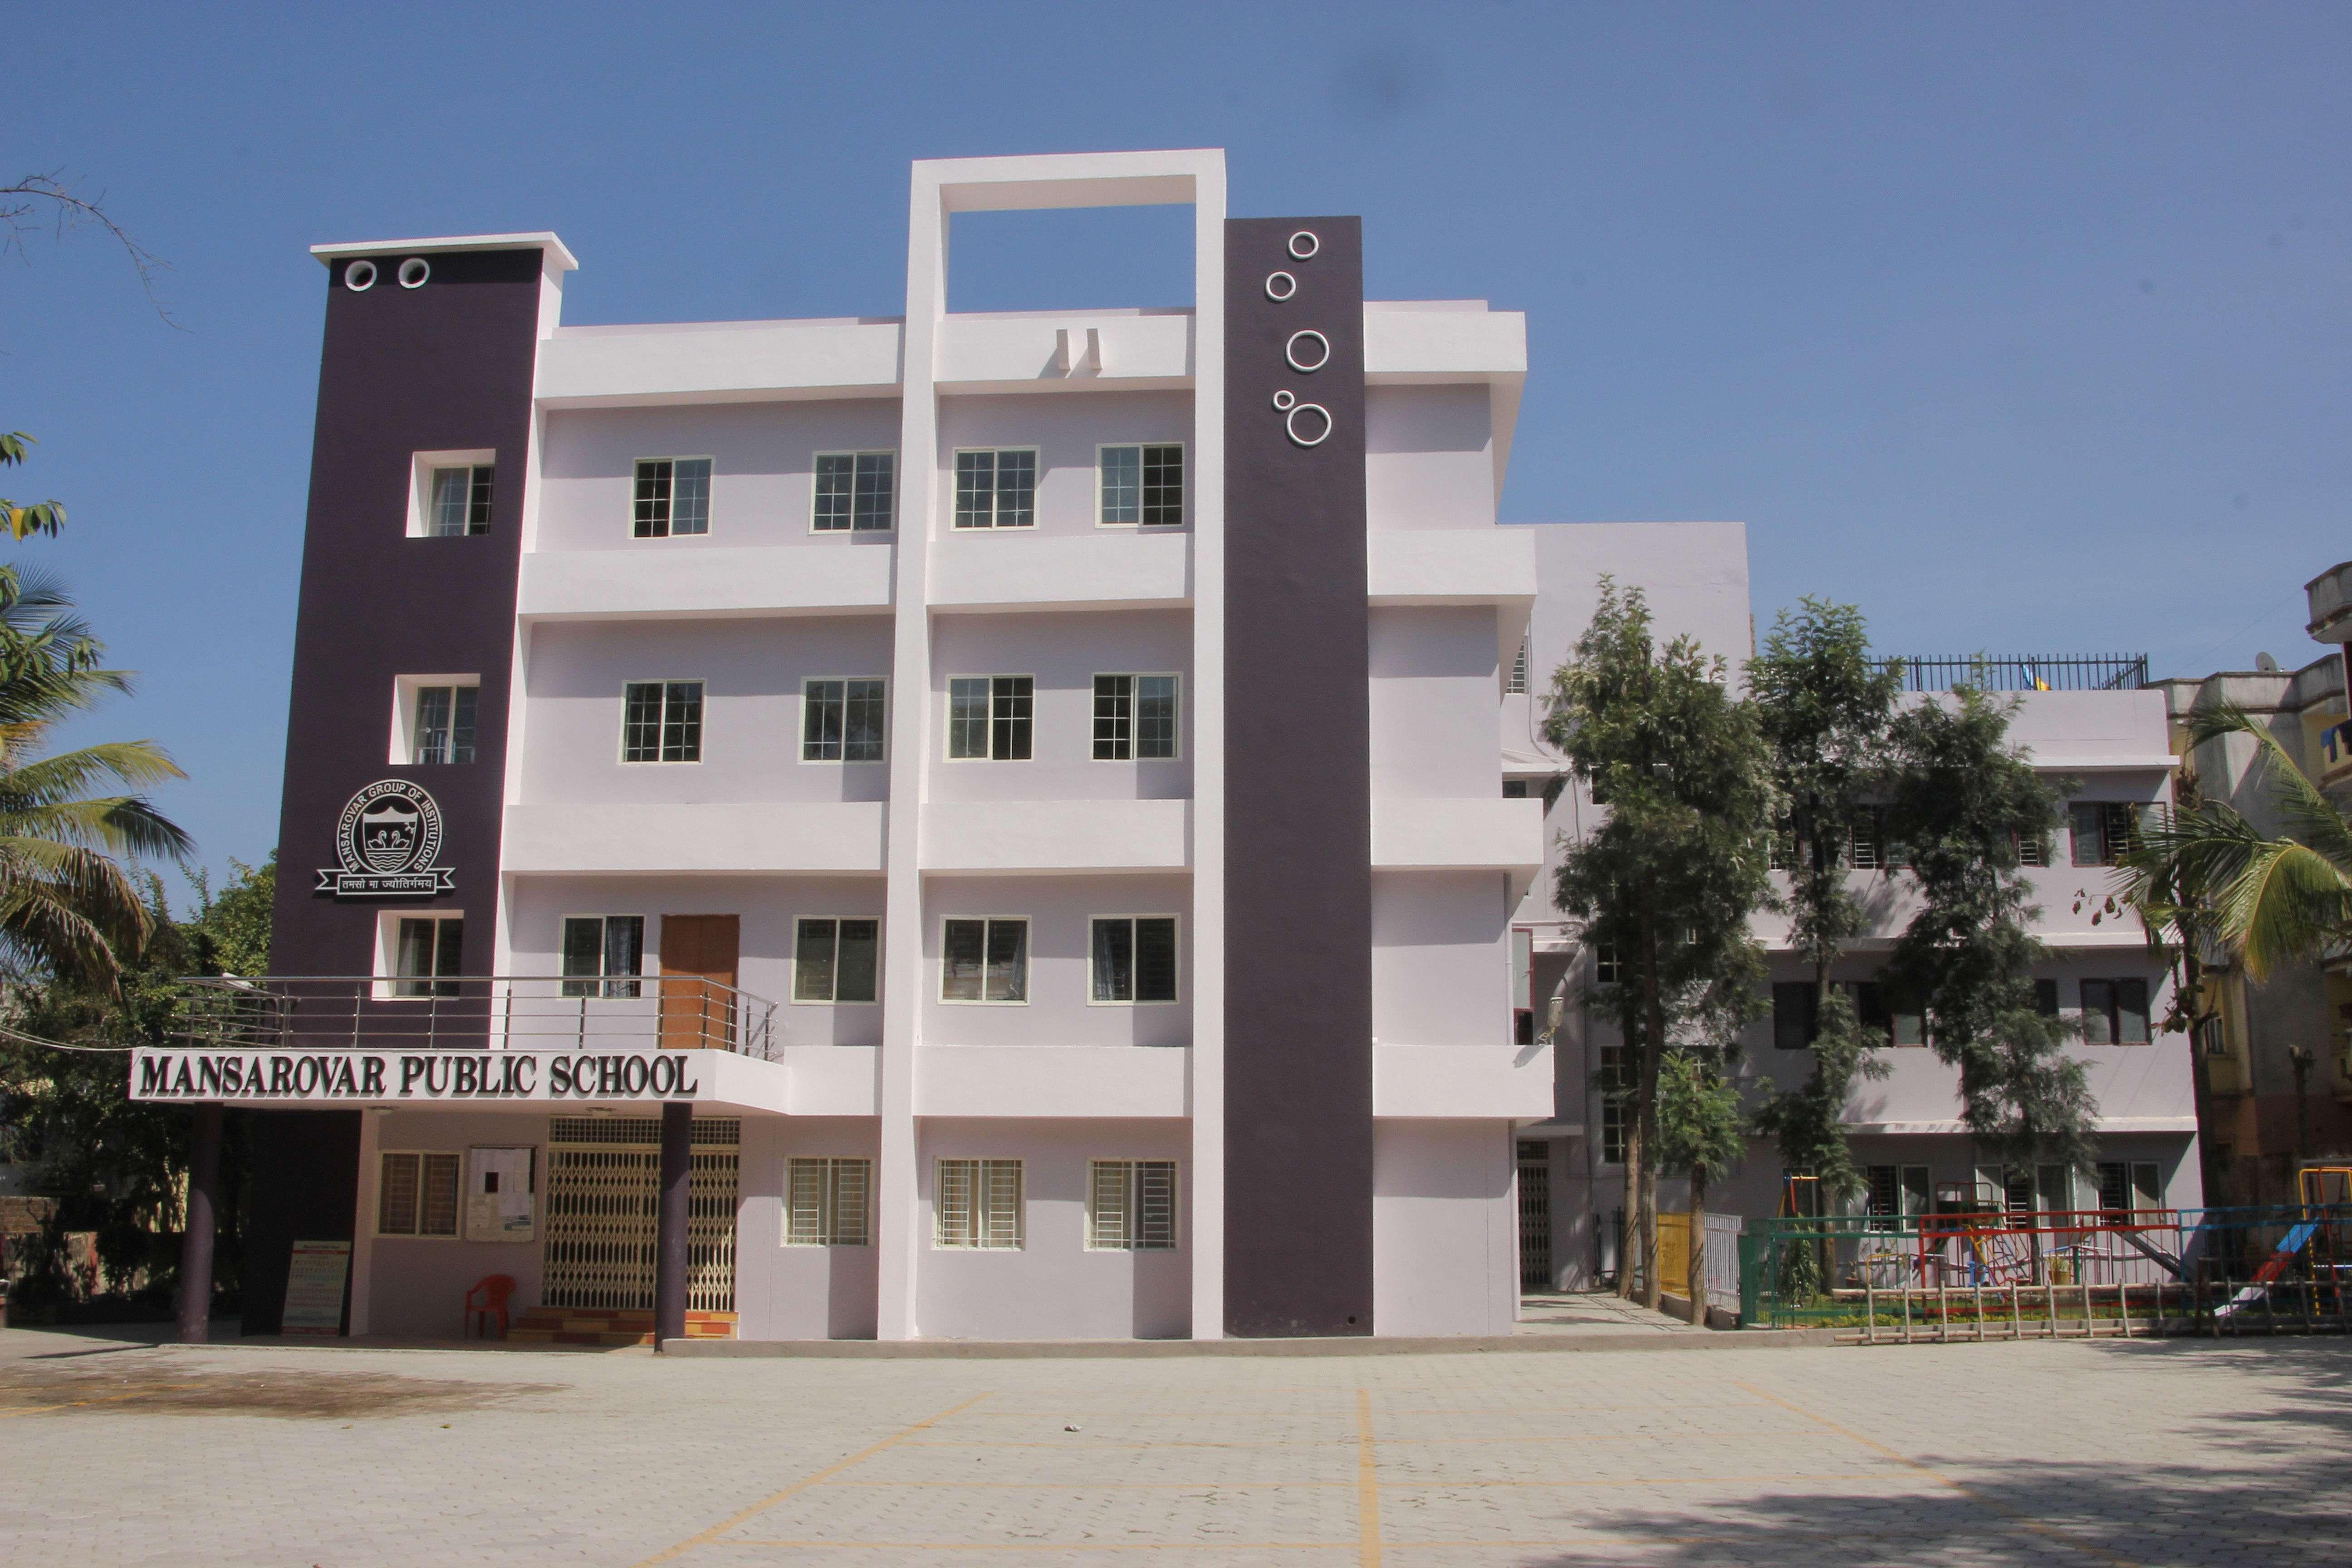 MANSAROVER PUBLIC SCHOOL KALAR ROAD BHOPAL MADHYA PRADESH 1030193